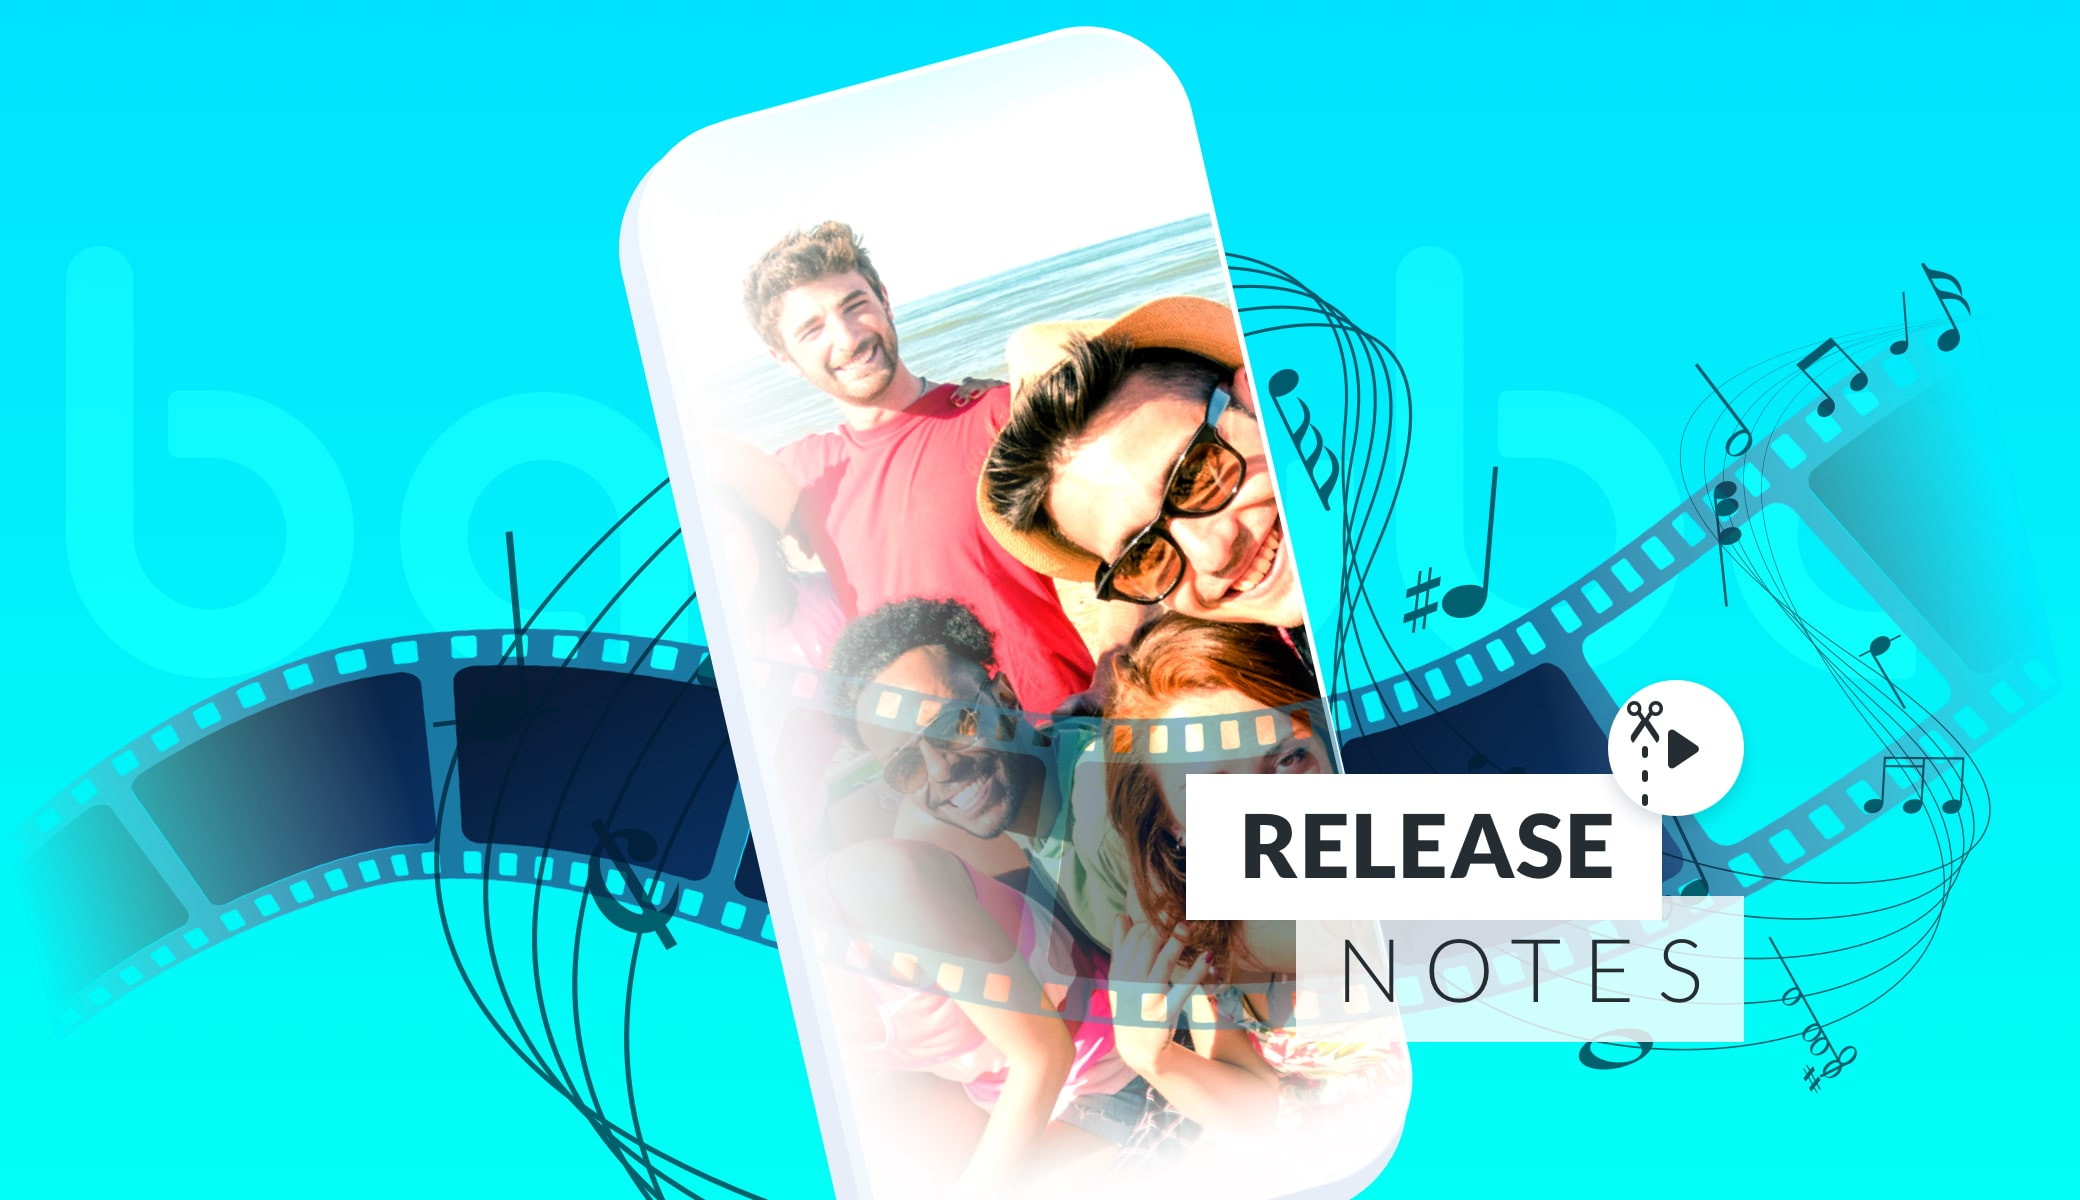 Video Editor SDK Release v1.0.13